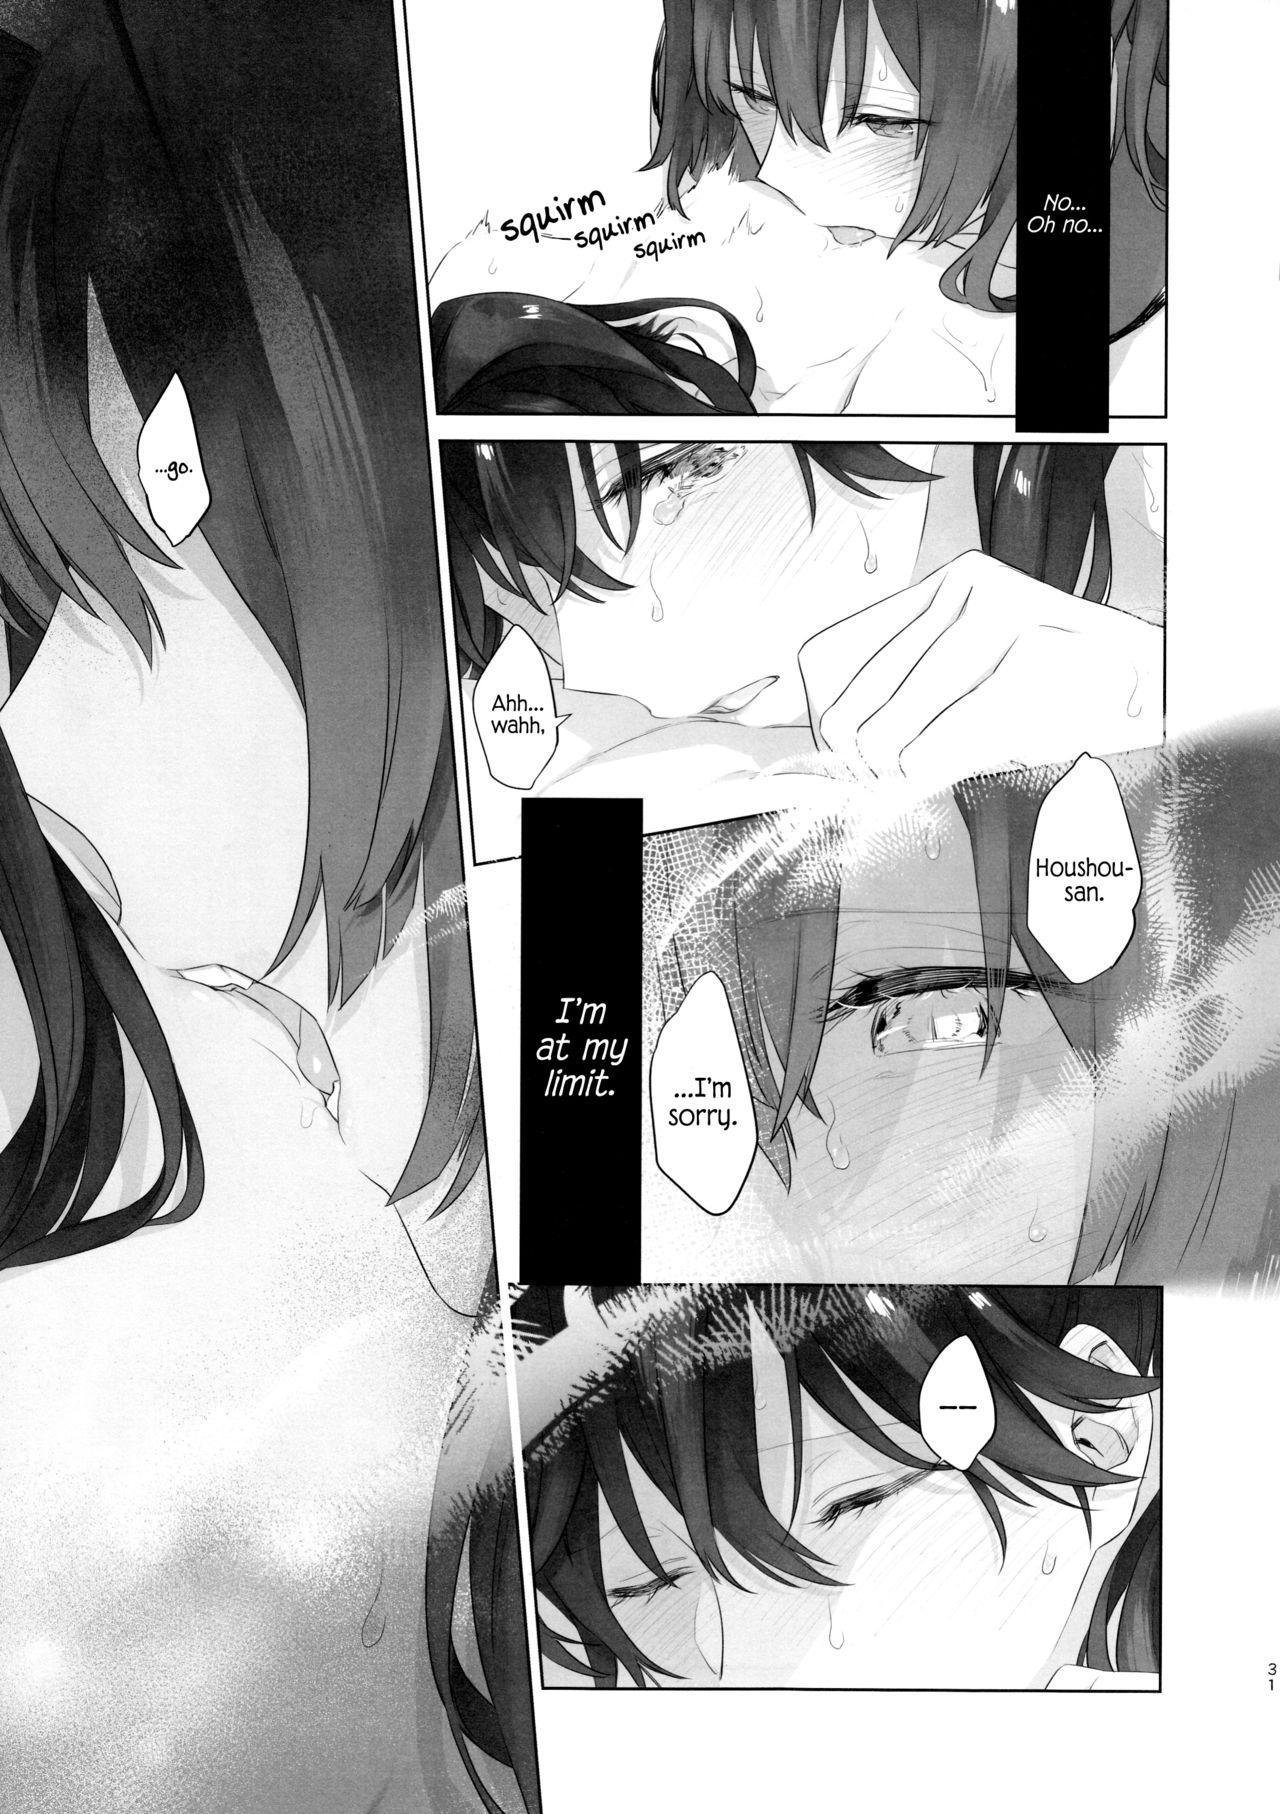 Ameagari no Hanayome - She became my bride after the rain. 29